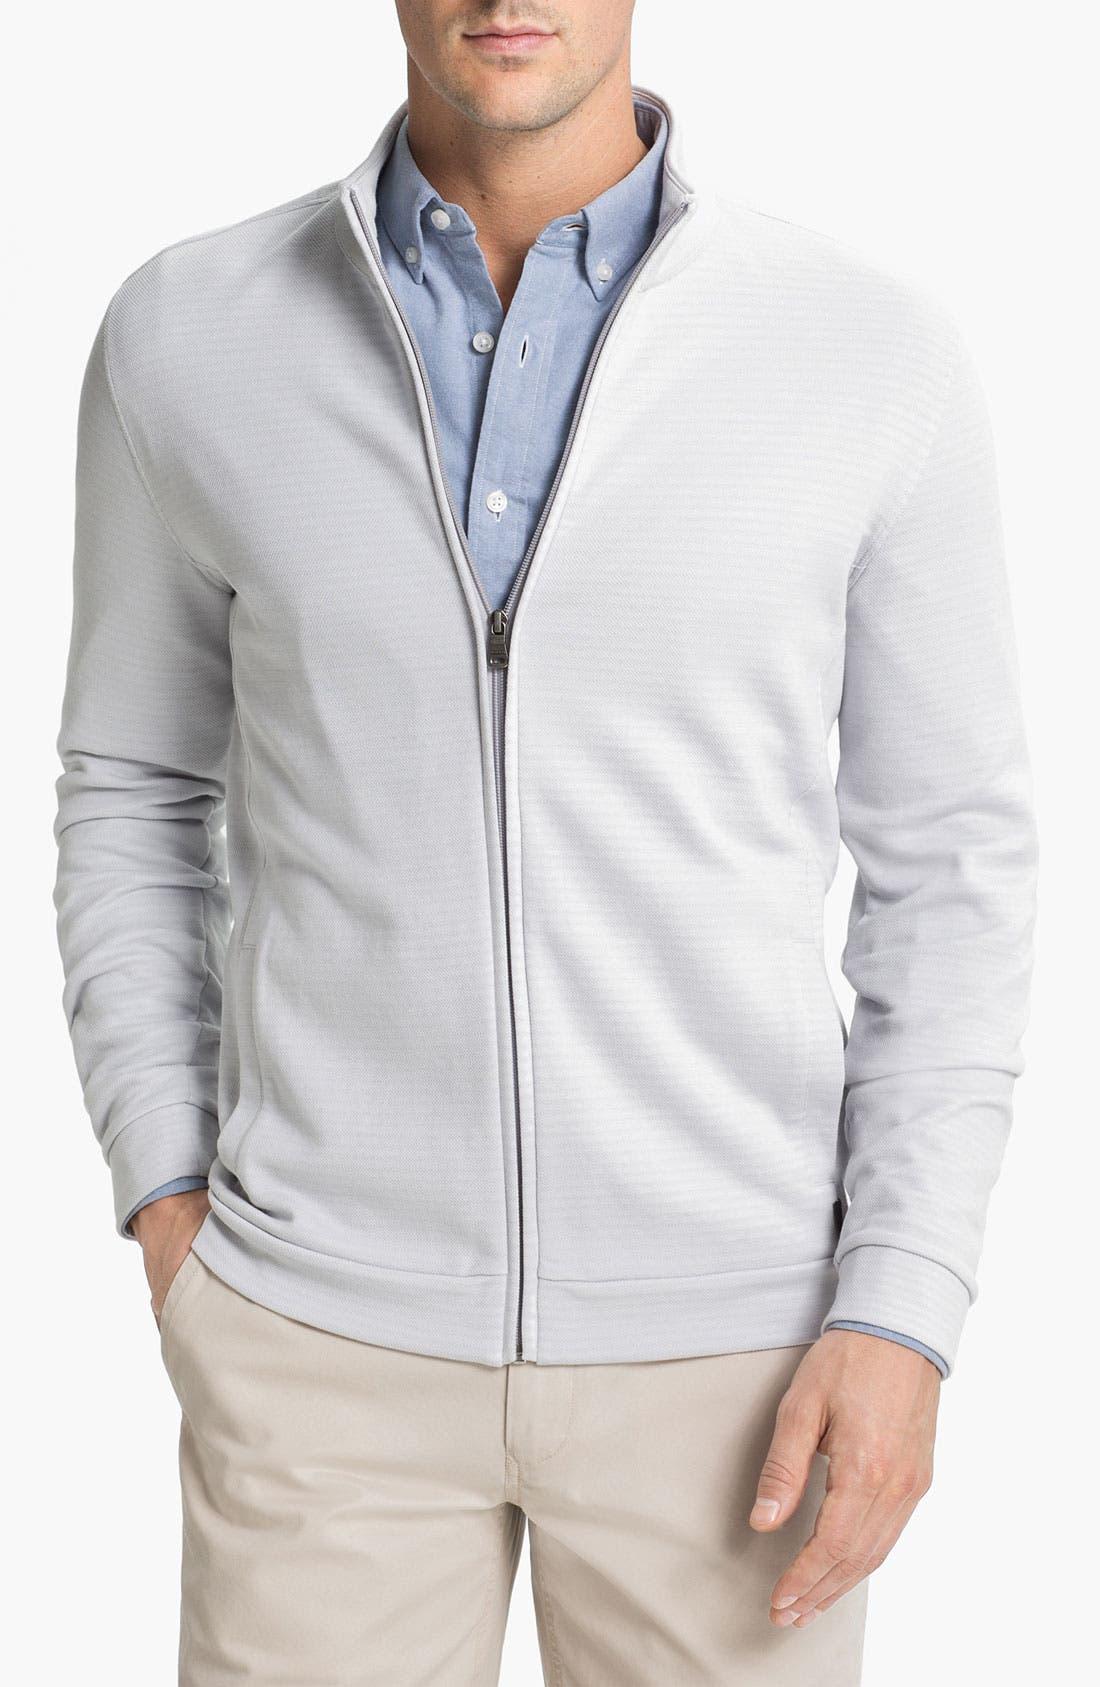 Alternate Image 1 Selected - BOSS Black 'Cannobio' Full Zip Knit Jacket